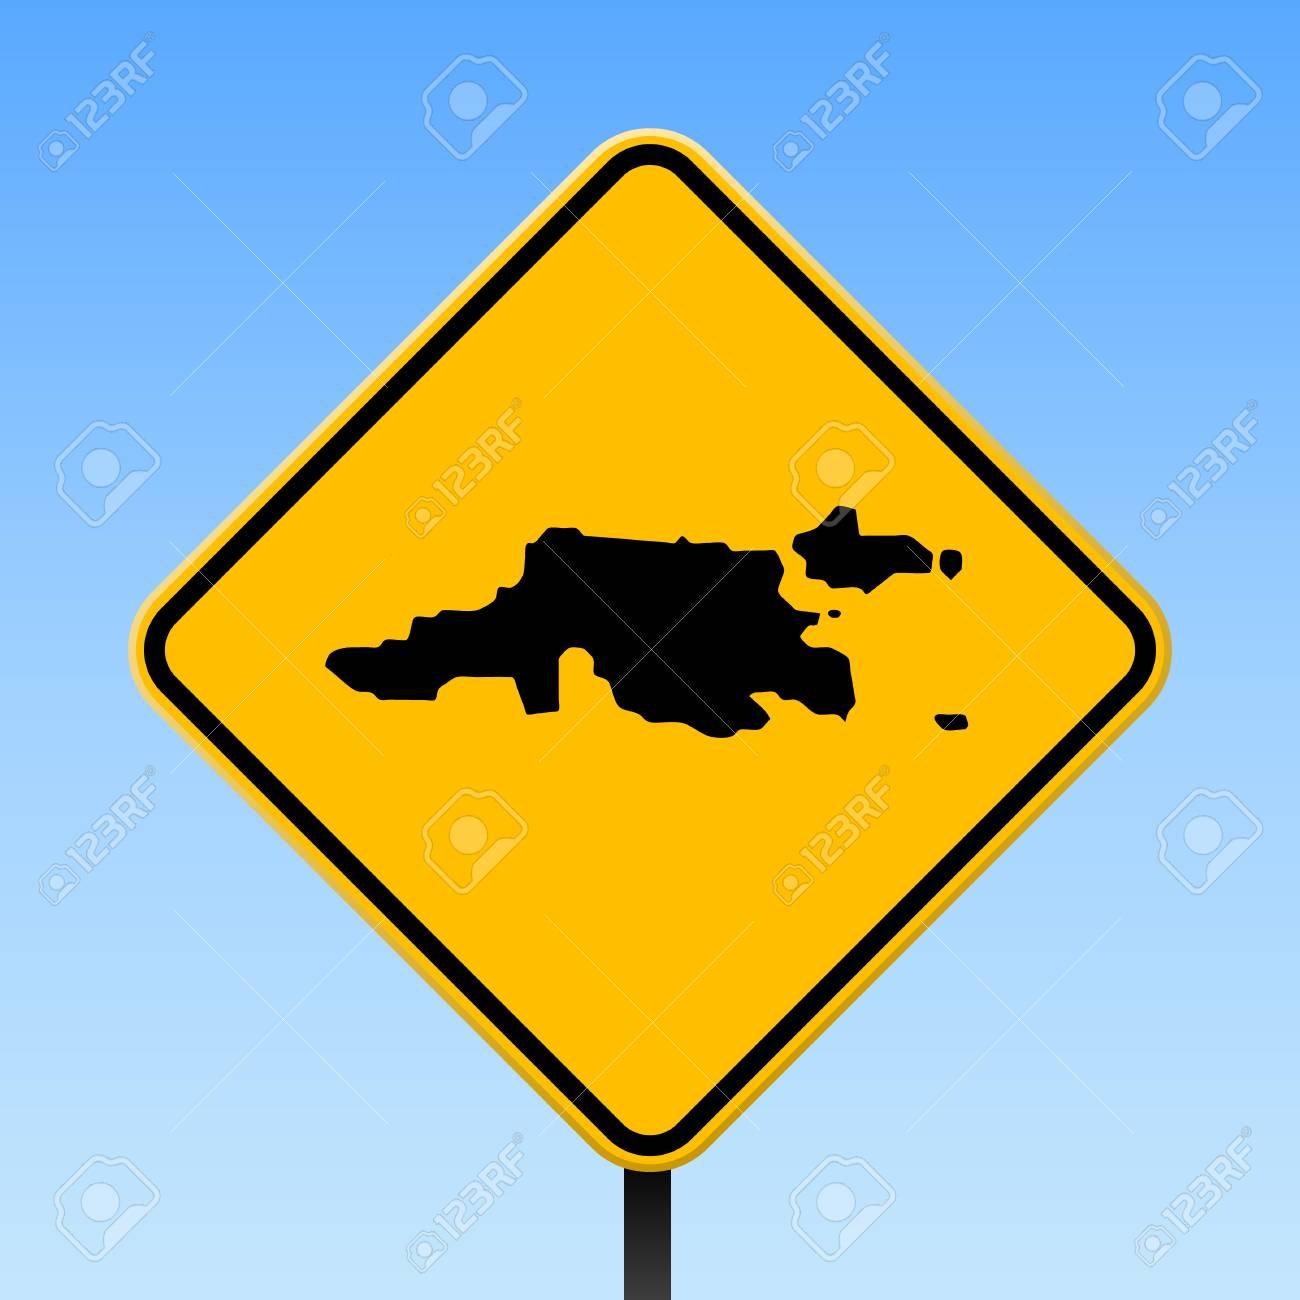 Jost Van Dyke Map On Road Sign Square Poster With Jost Van Dyke